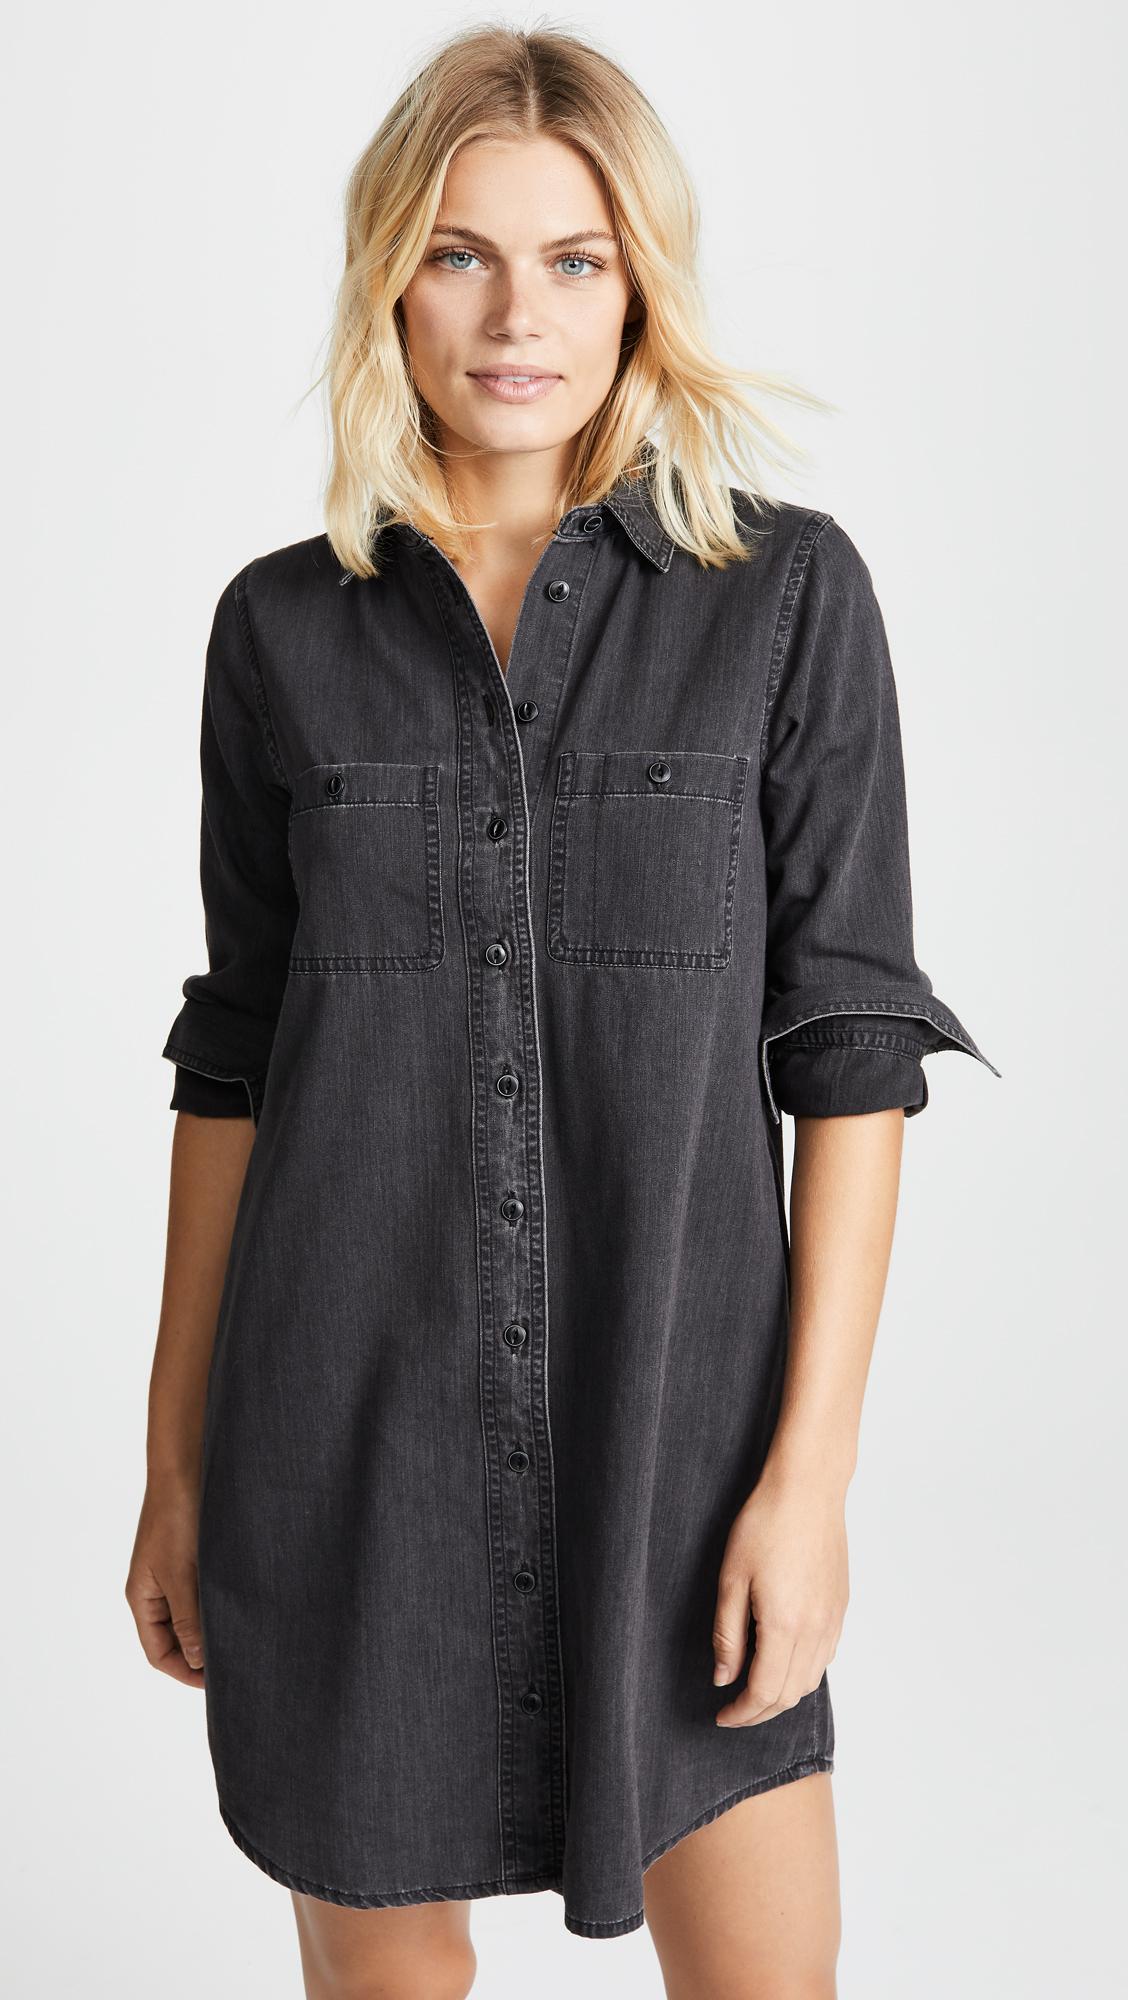 2c82310e6fb Madewell Long Sleeve Denim Shirt Dress - Gomes Weine AG